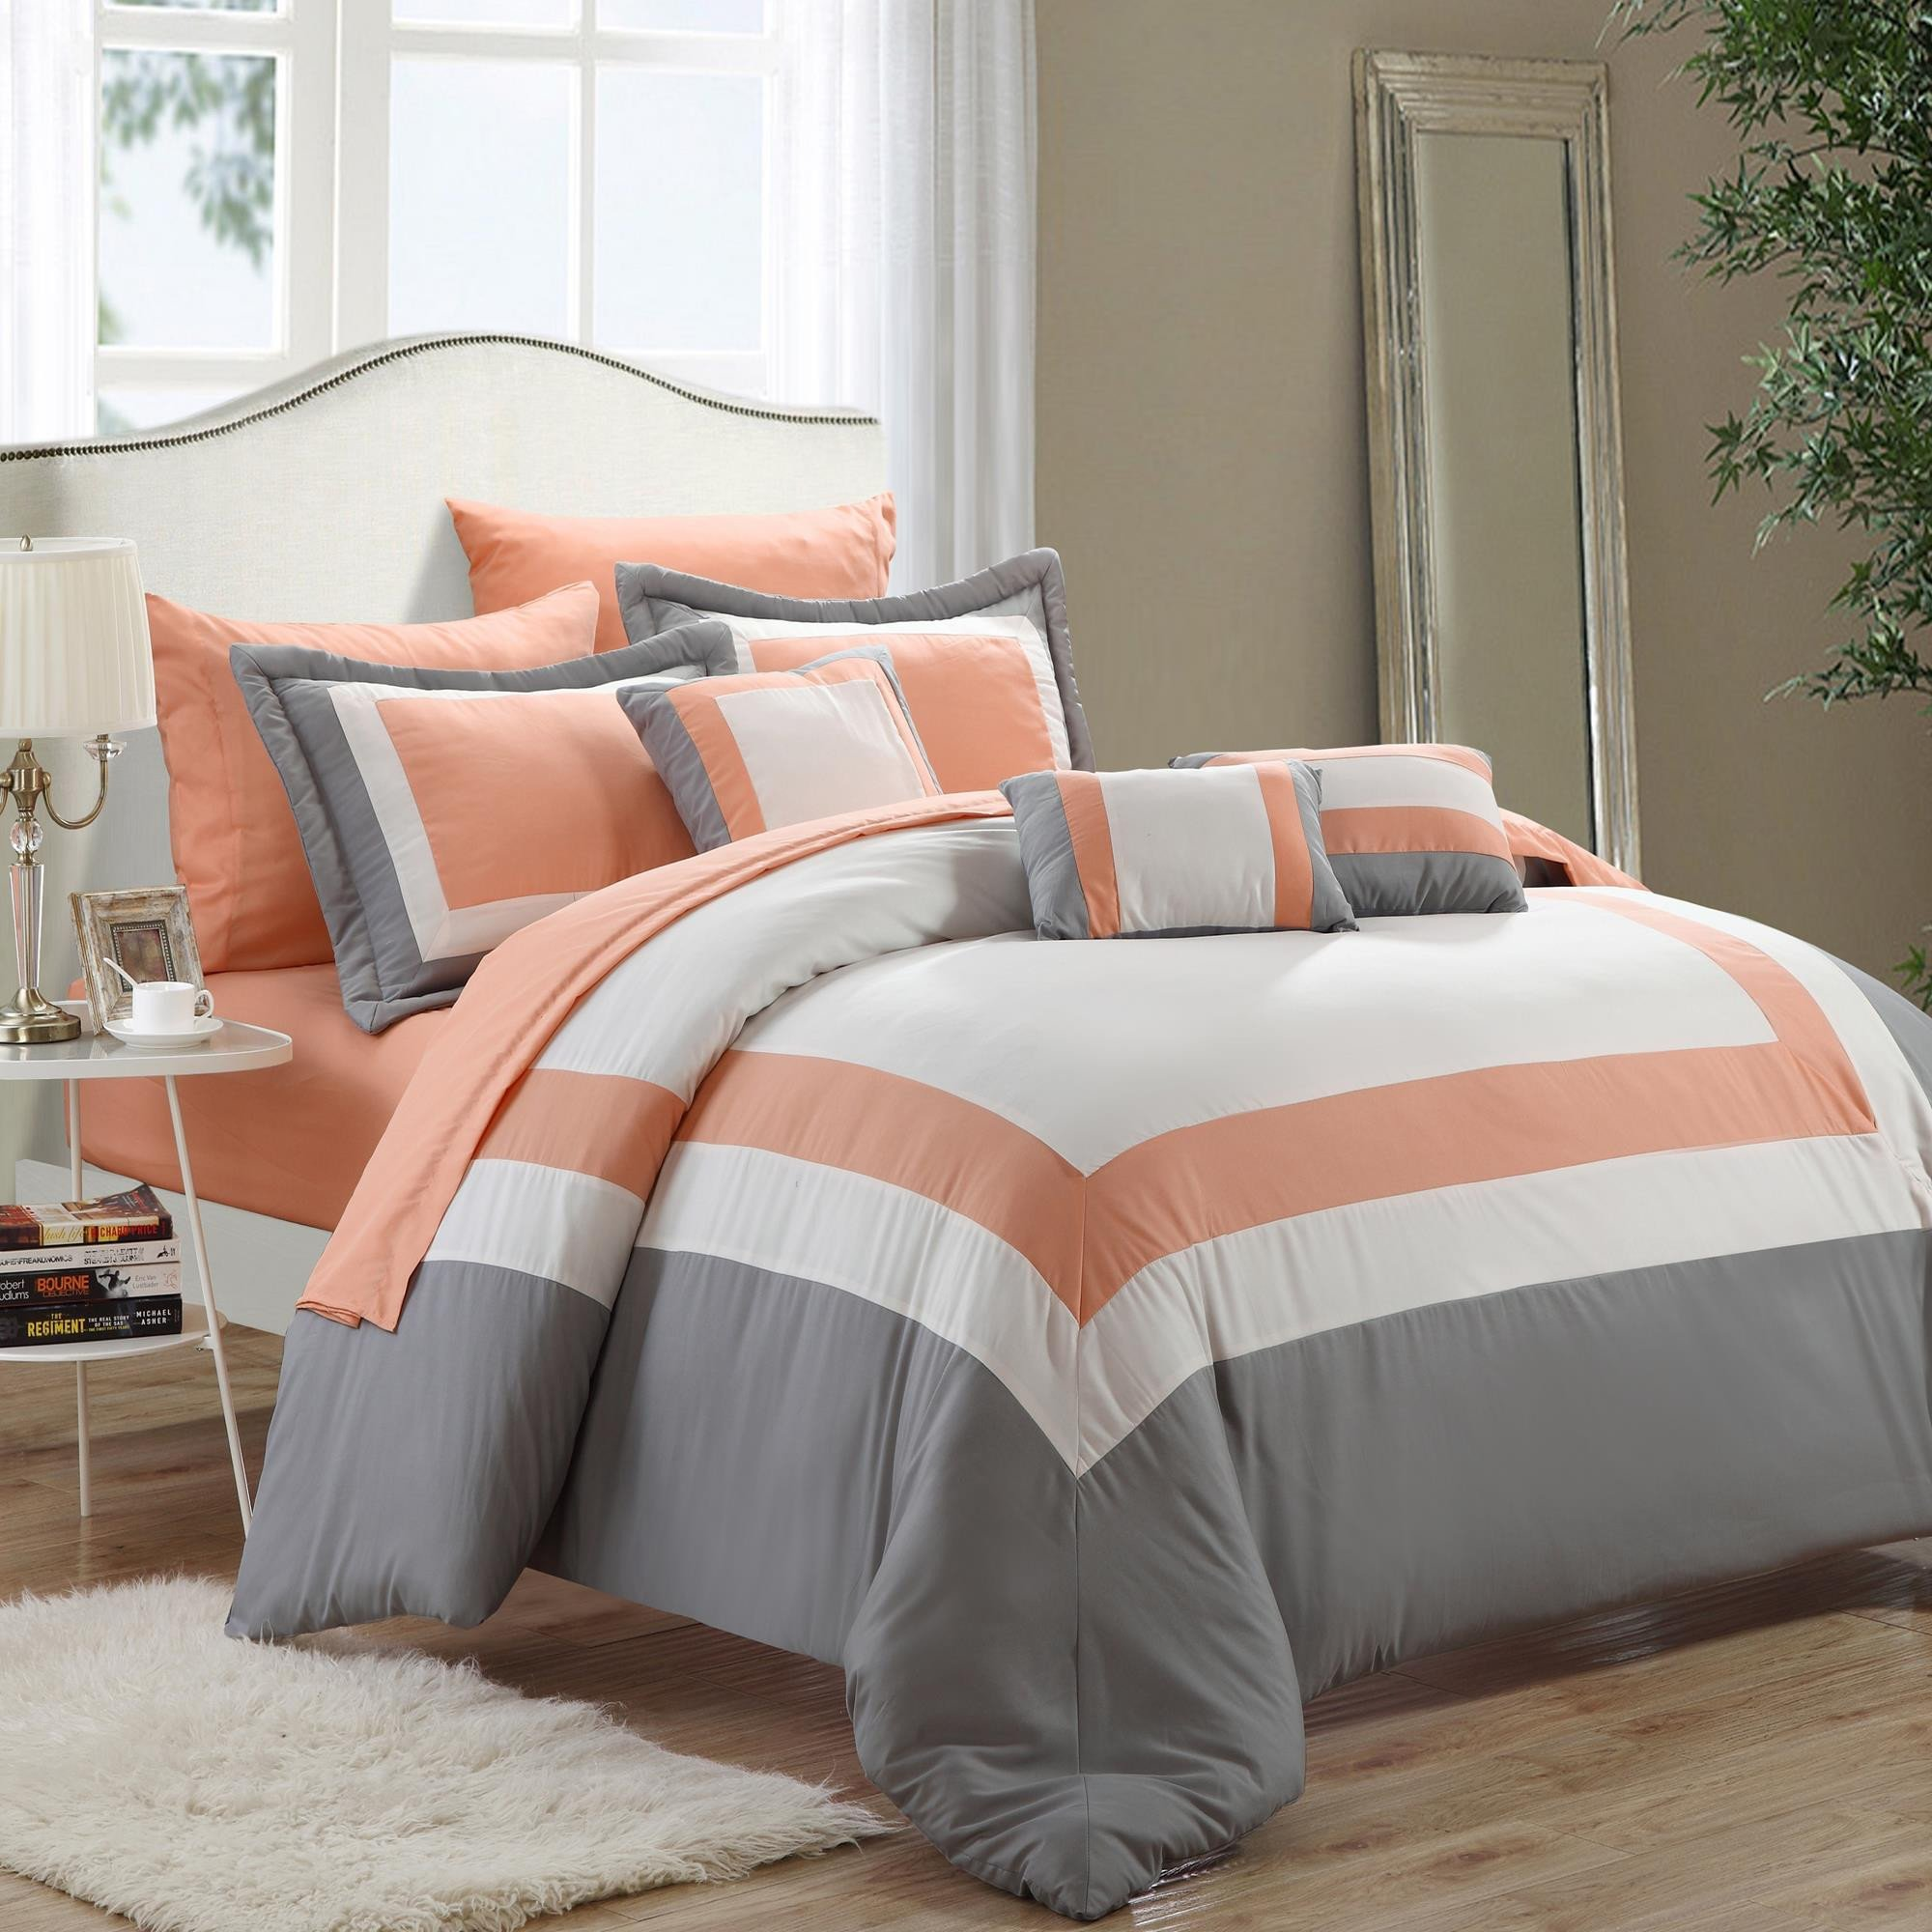 Duke Peach White Grey 10 Piece Comforter Bed In A Bag Set Walmart Com Walmart Com